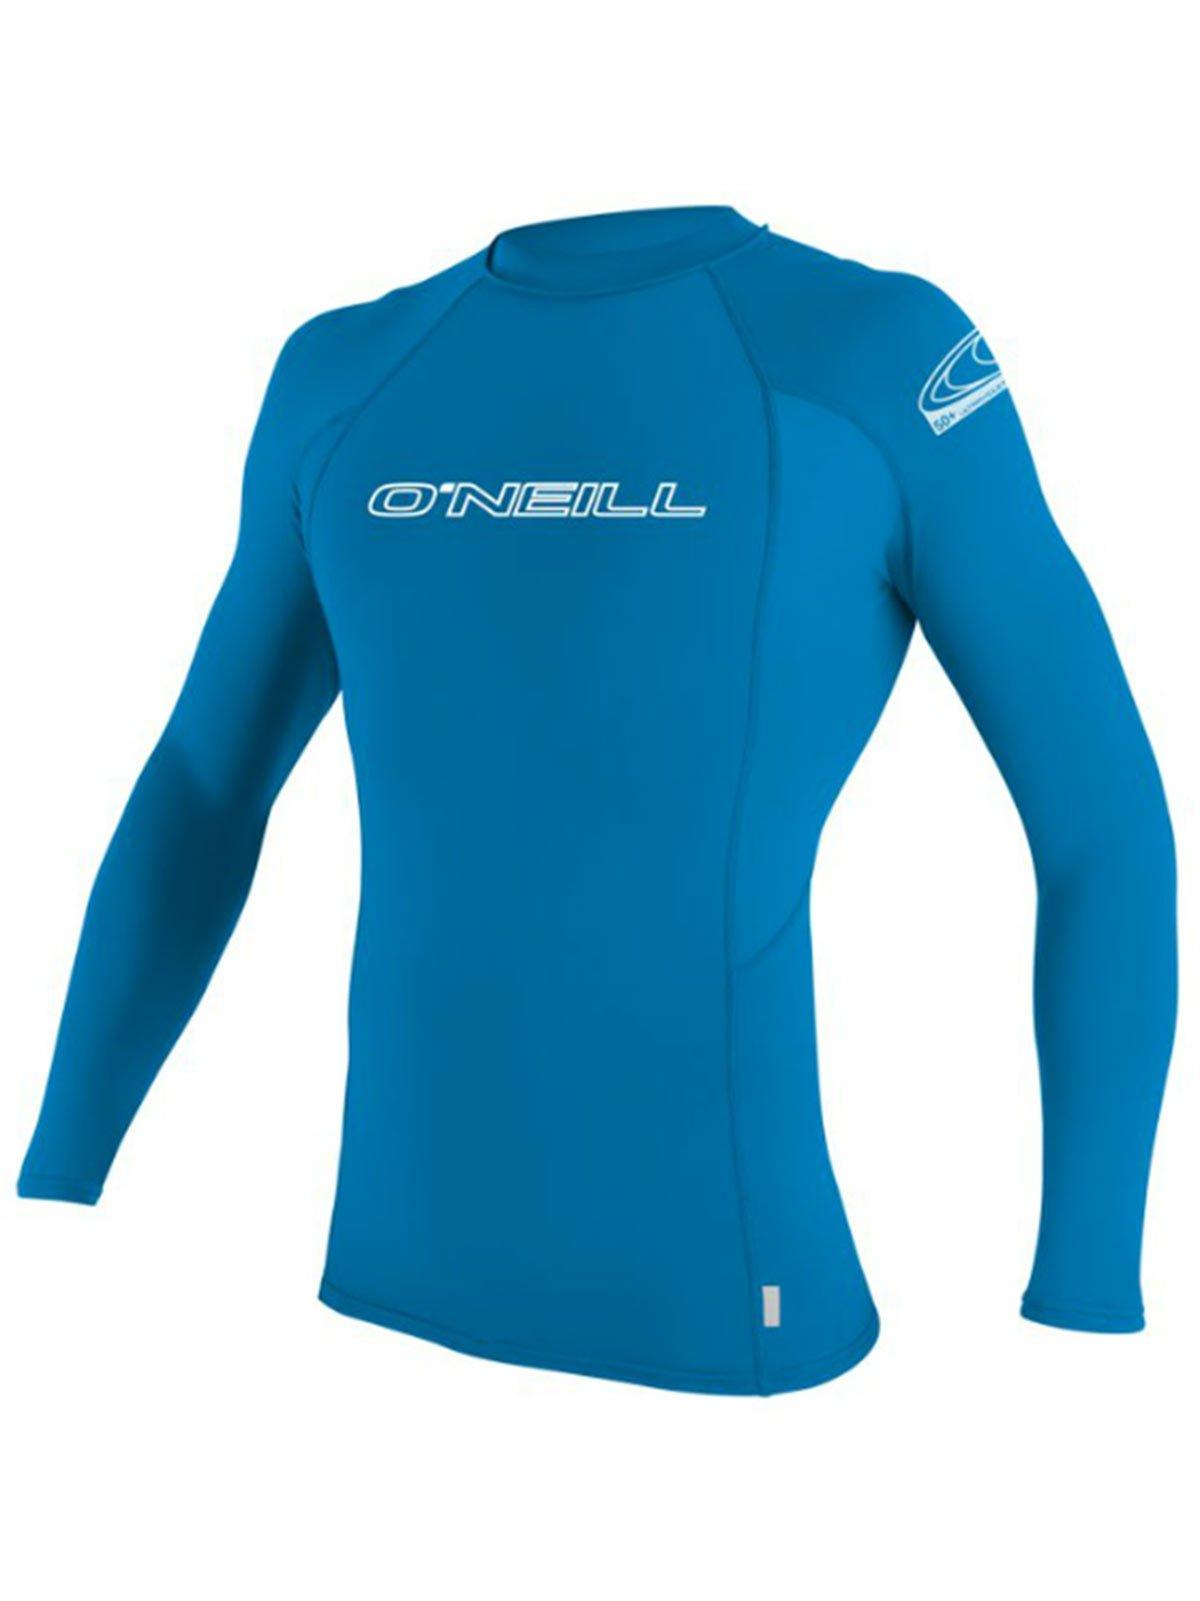 O'Neill men's basic skins long sleeve rashguard M Brite Blue (3342IS)